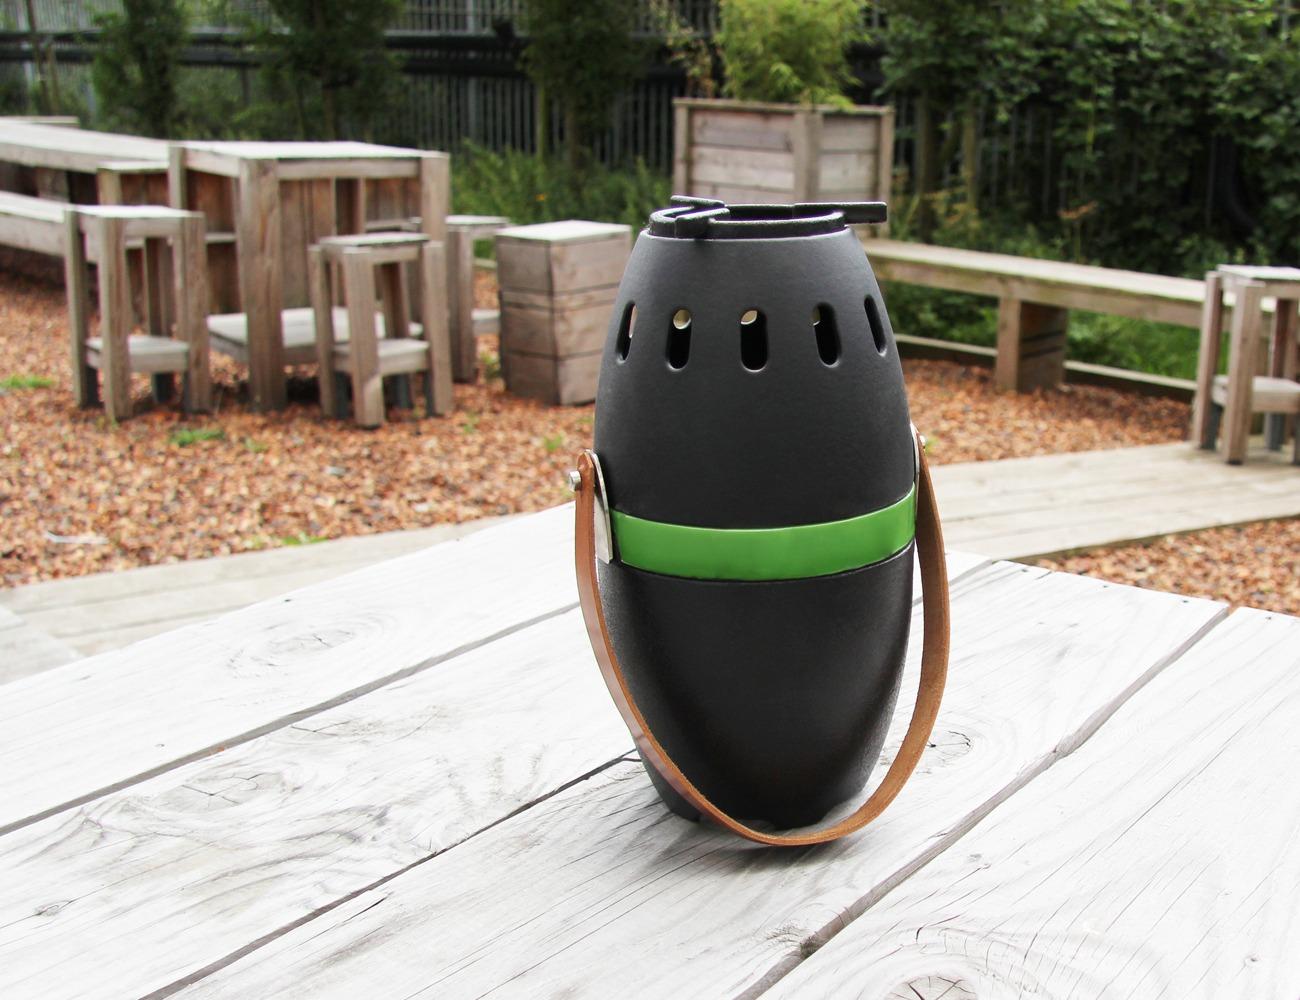 ikiPele Compact Sustainable Burner